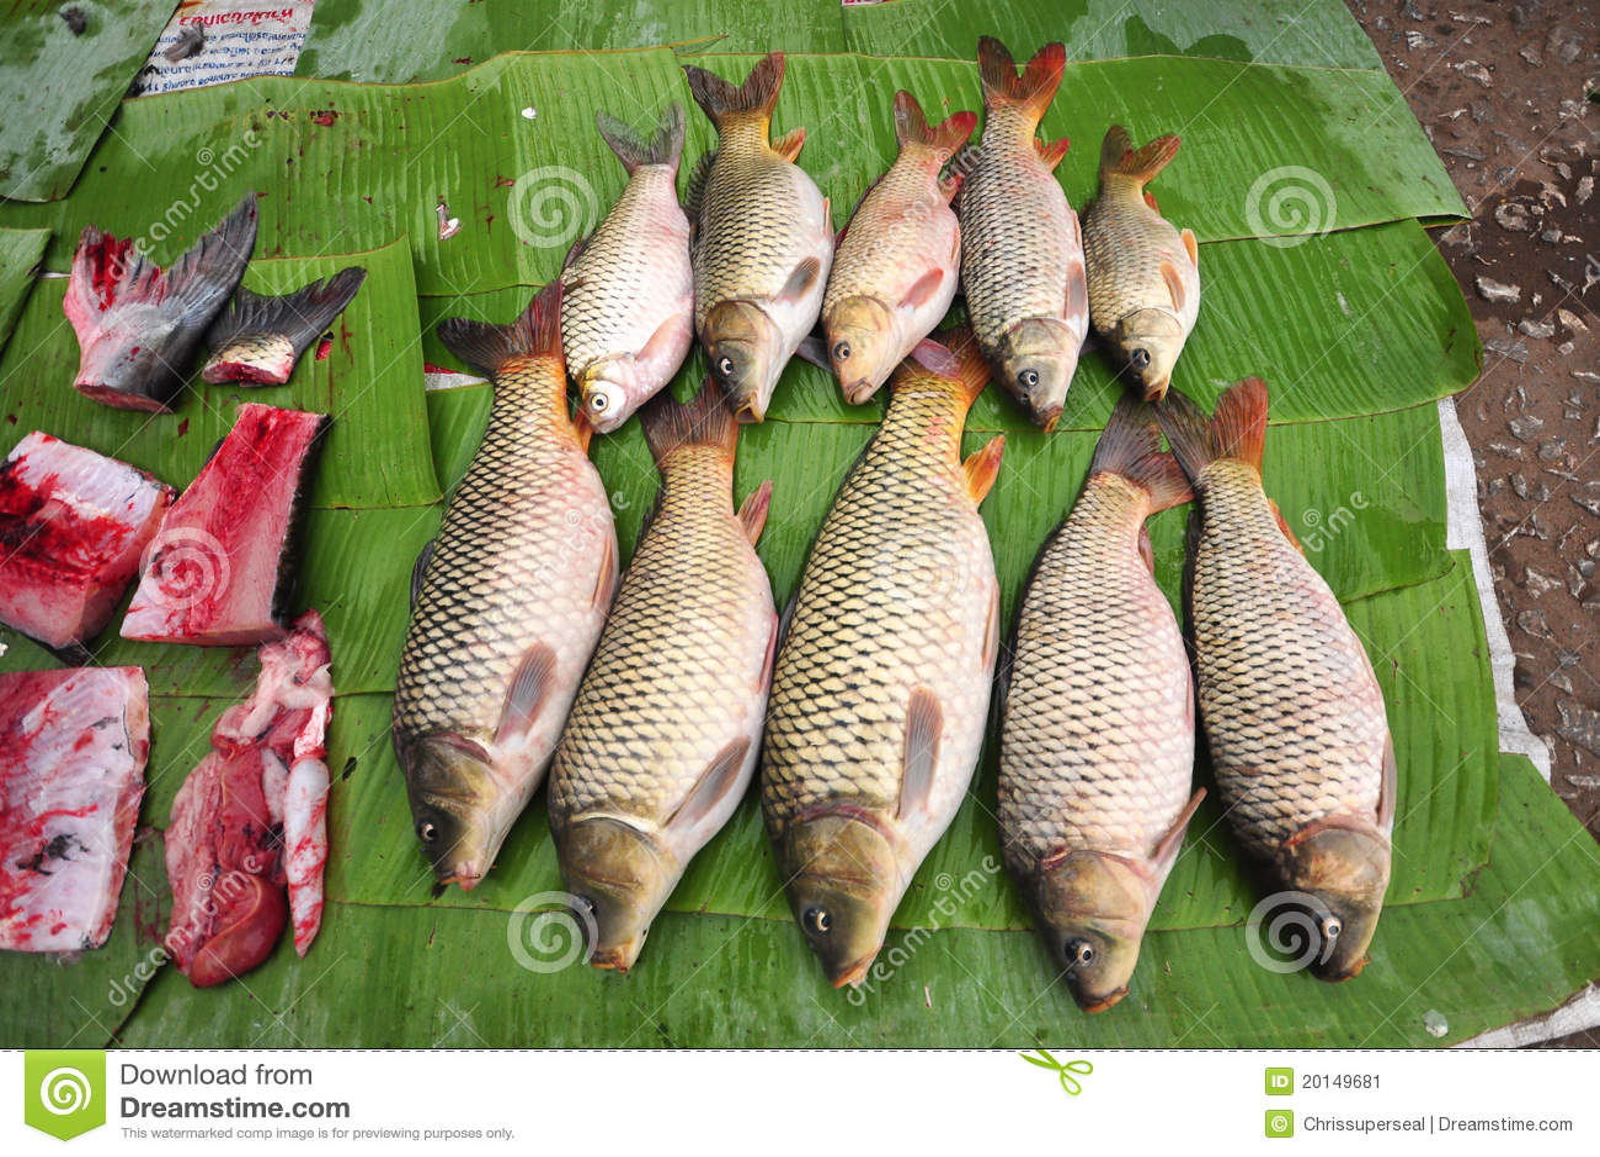 Fresh fish fresh market stock image image 20149681 for Fish stocking prices